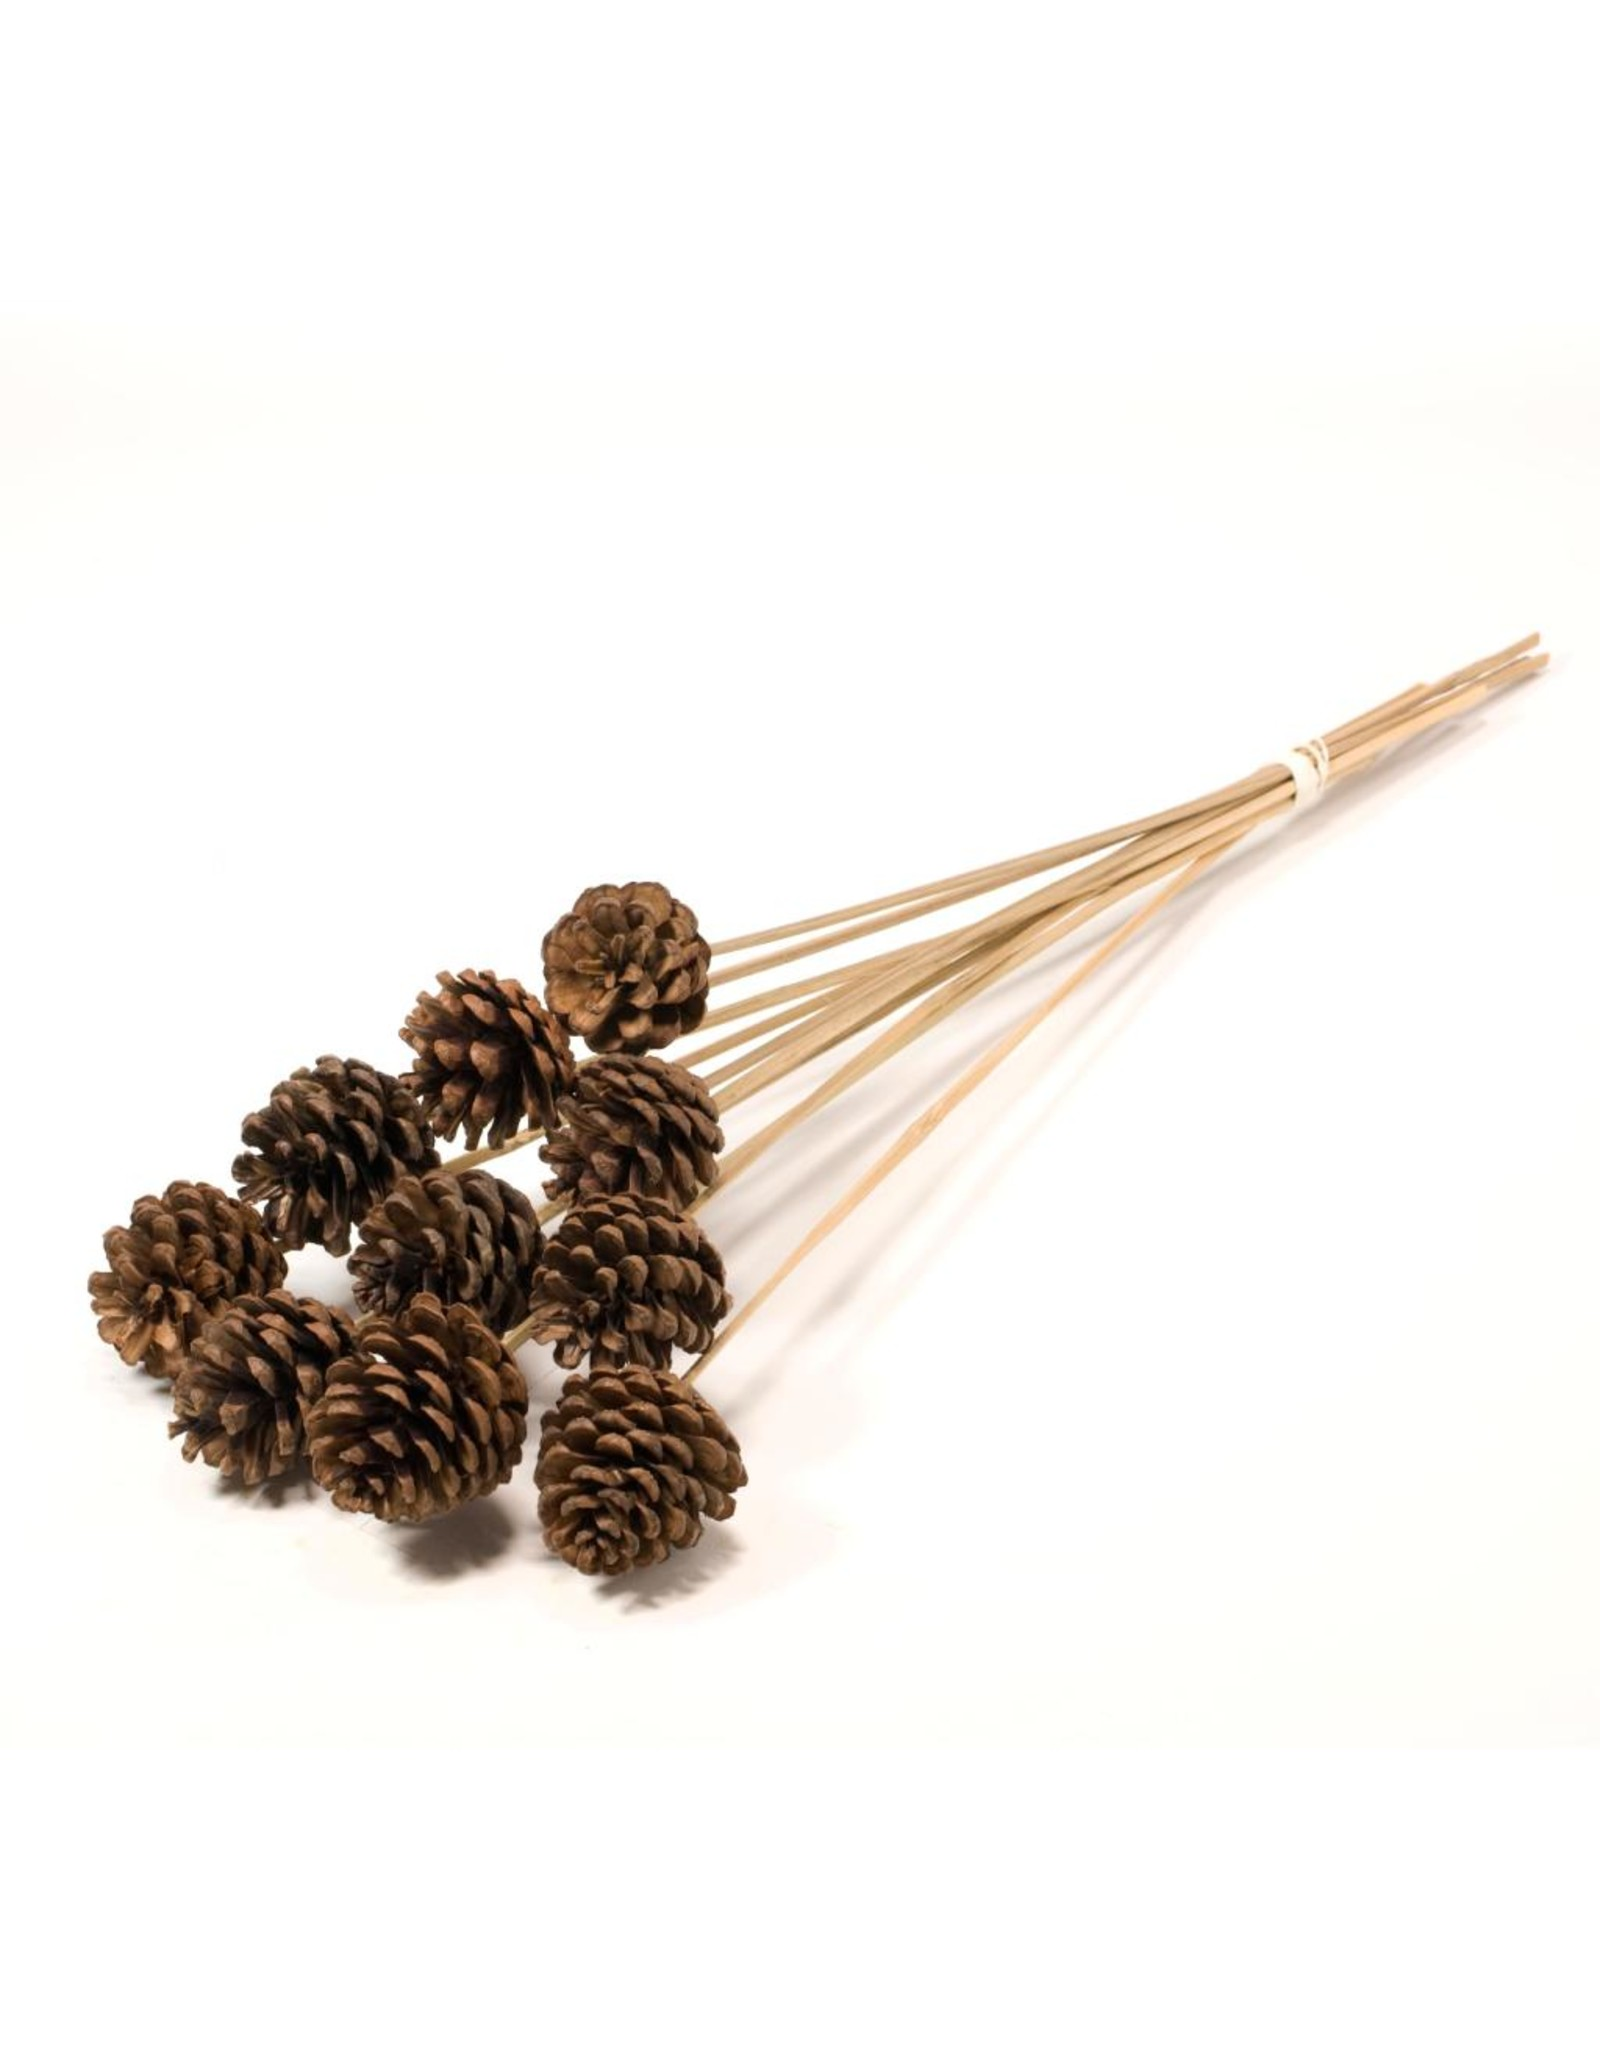 LDD Pine cone 4-5cm o/s 10pc natural x 15